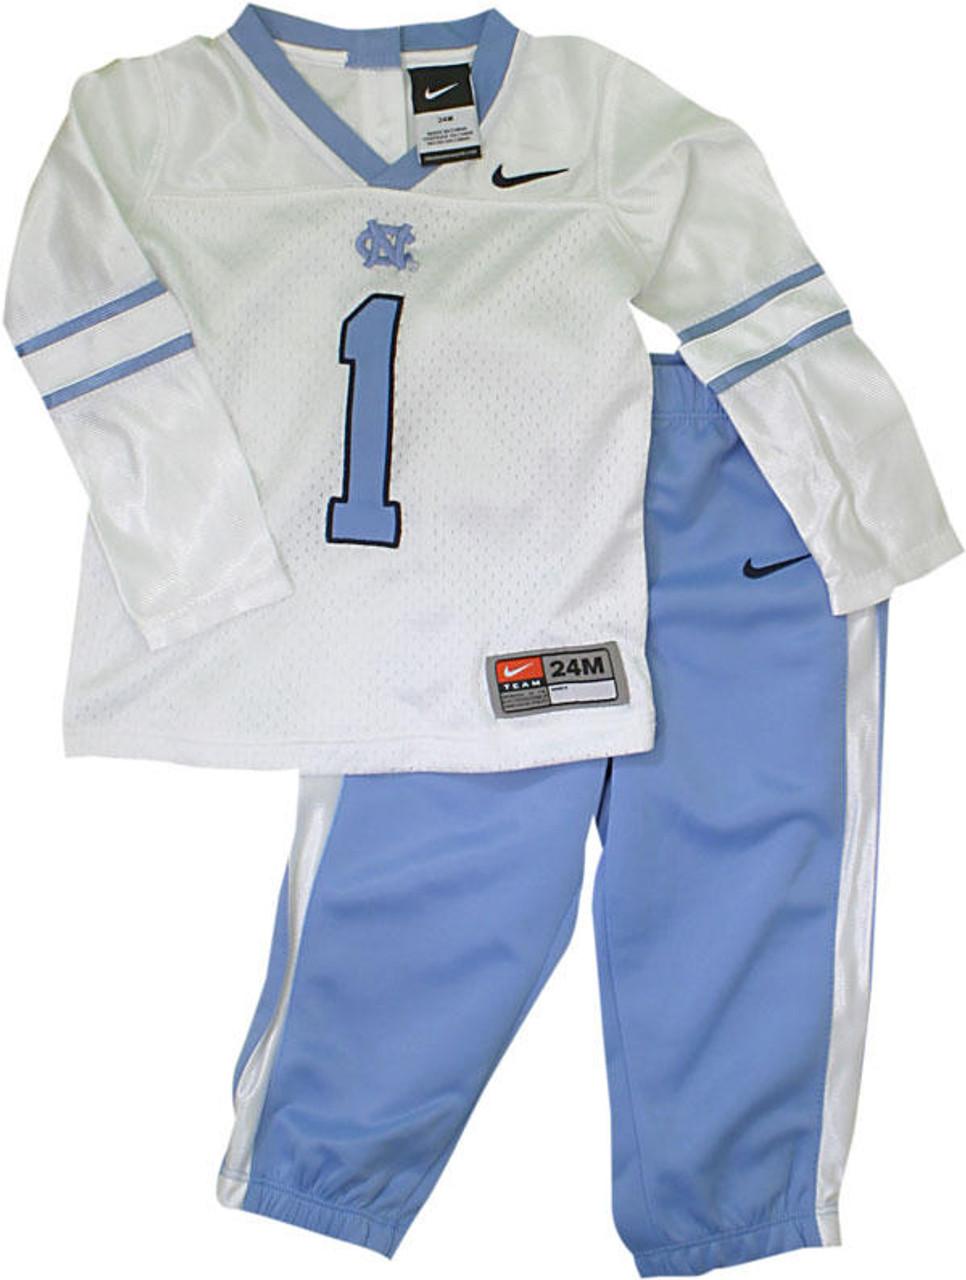 infant football jersey